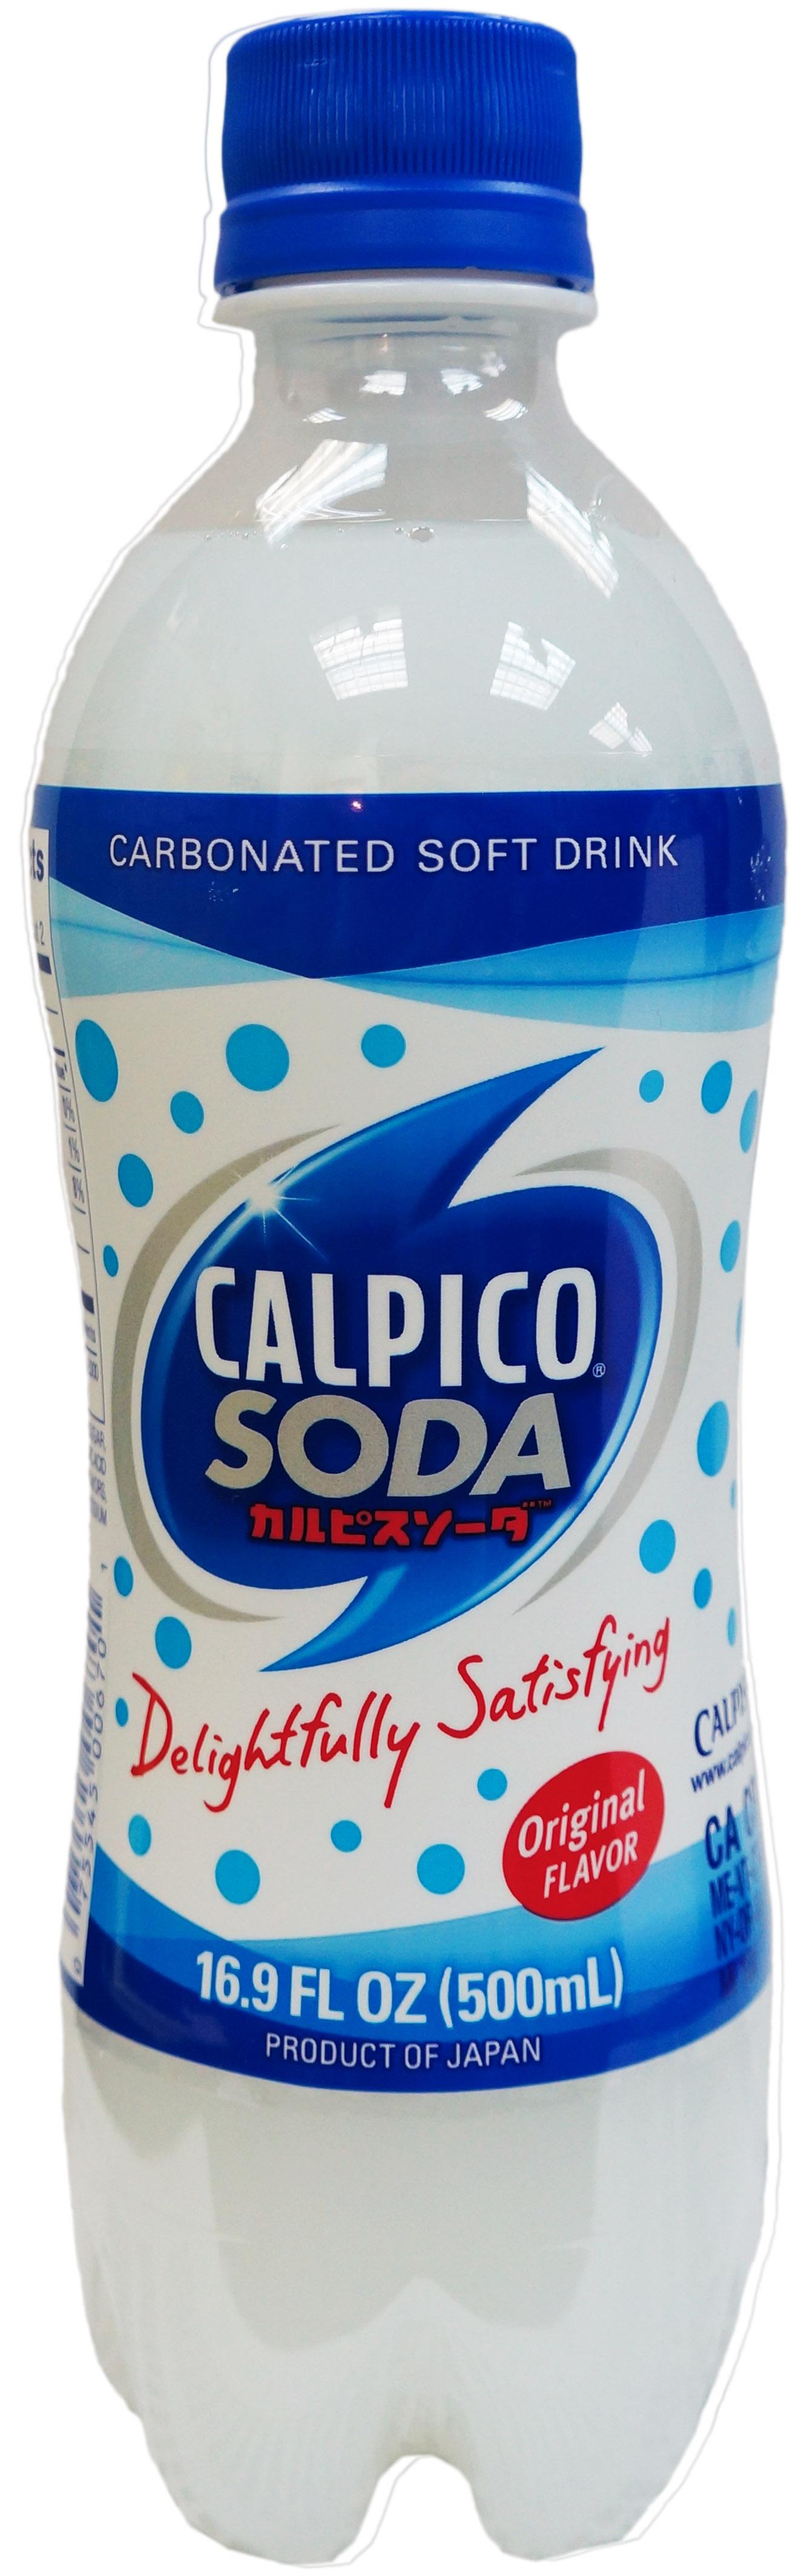 Calpico Soda 272504c145 Soft Drinks Carbonated Soft Drinks Drinks